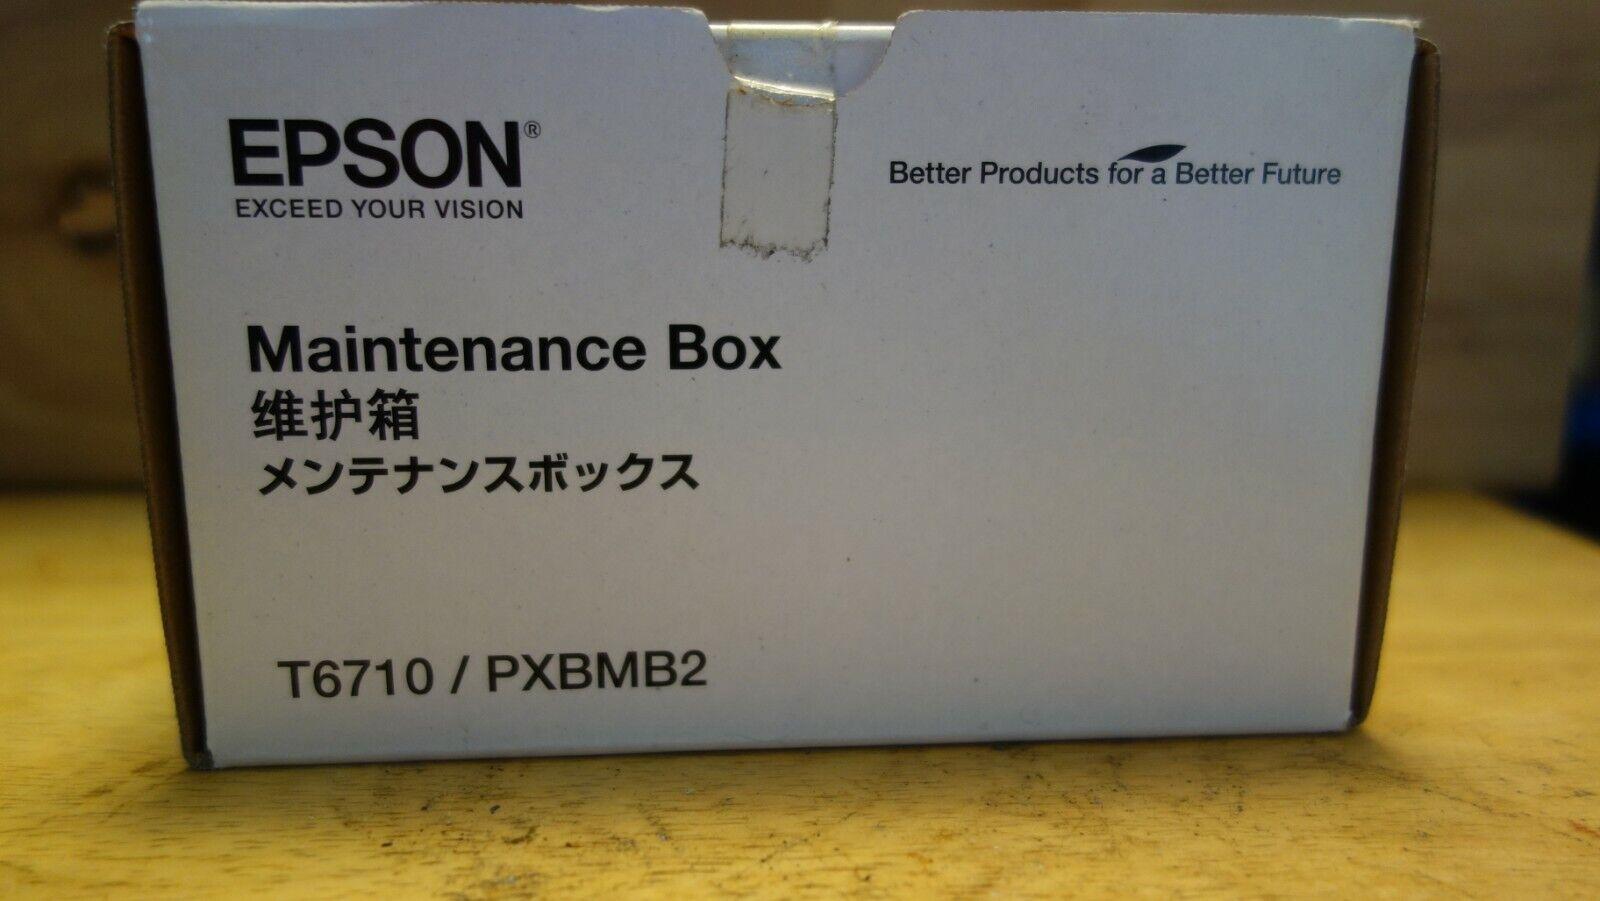 Authentic Epson Ink Maintenance Box T6710 / PXBMB2 New In Original Box  - $8.25